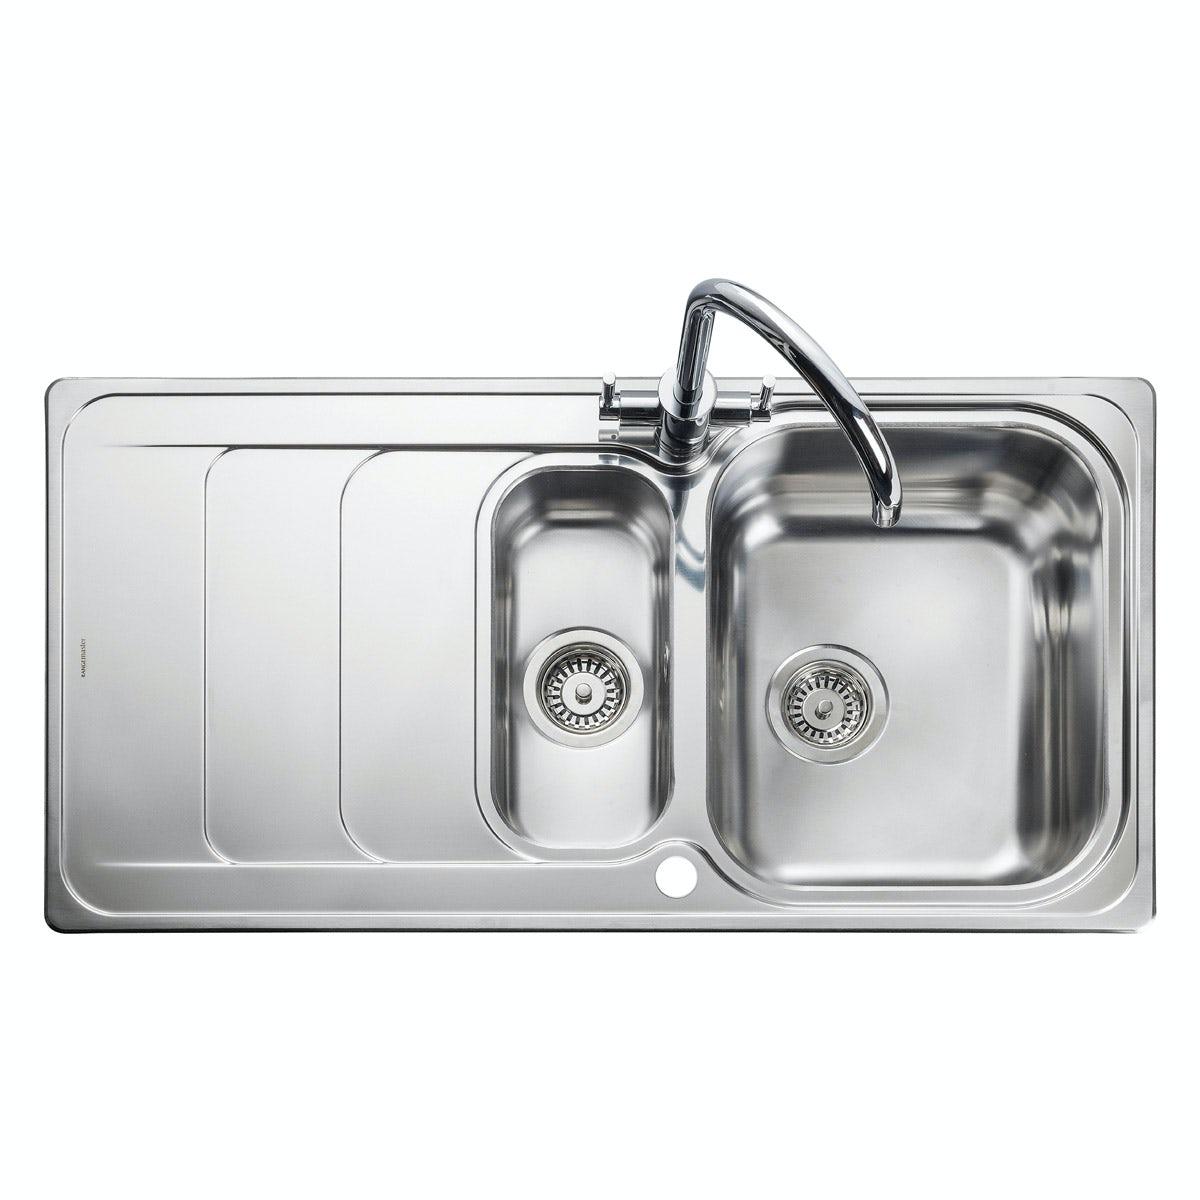 Rangemaster Houston 1.5 bowl reversible kitchen sink with waste kit